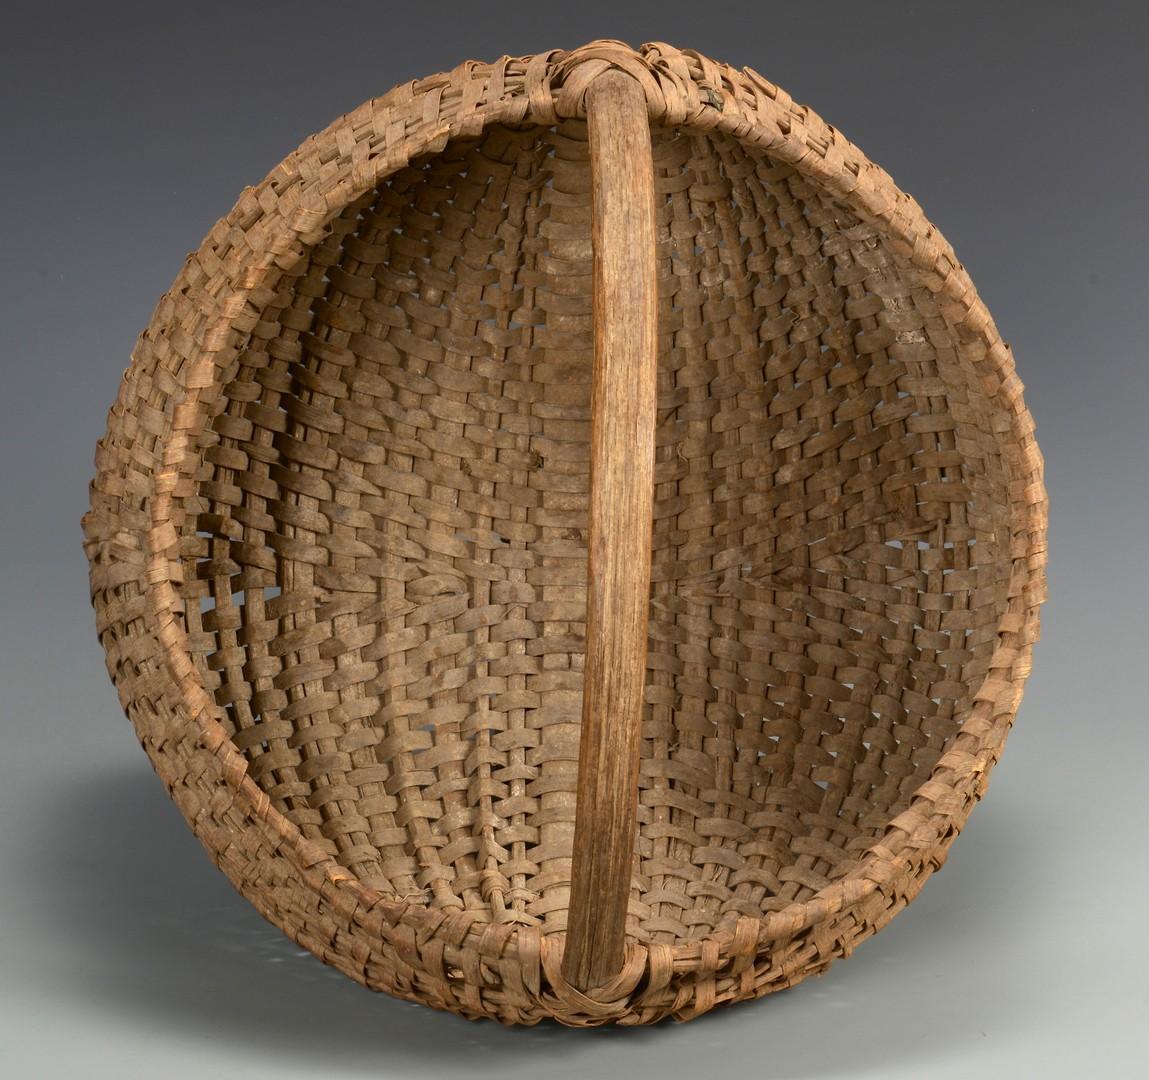 Lot 525: 2 Anderson County, TN Buttocks Baskets